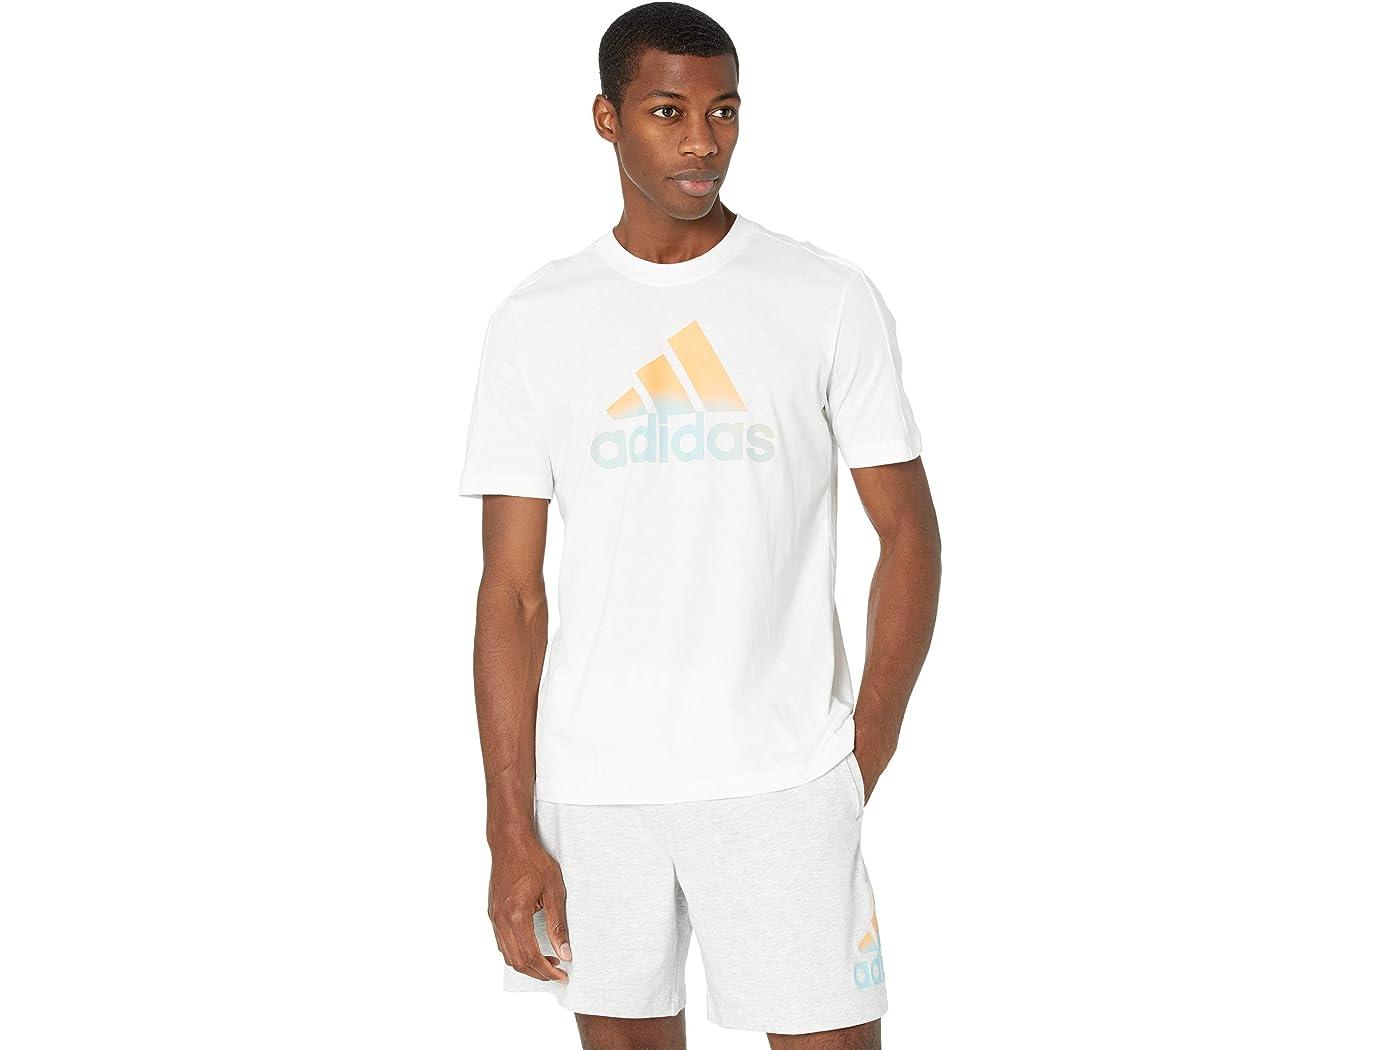 Adidas Essentials Tee